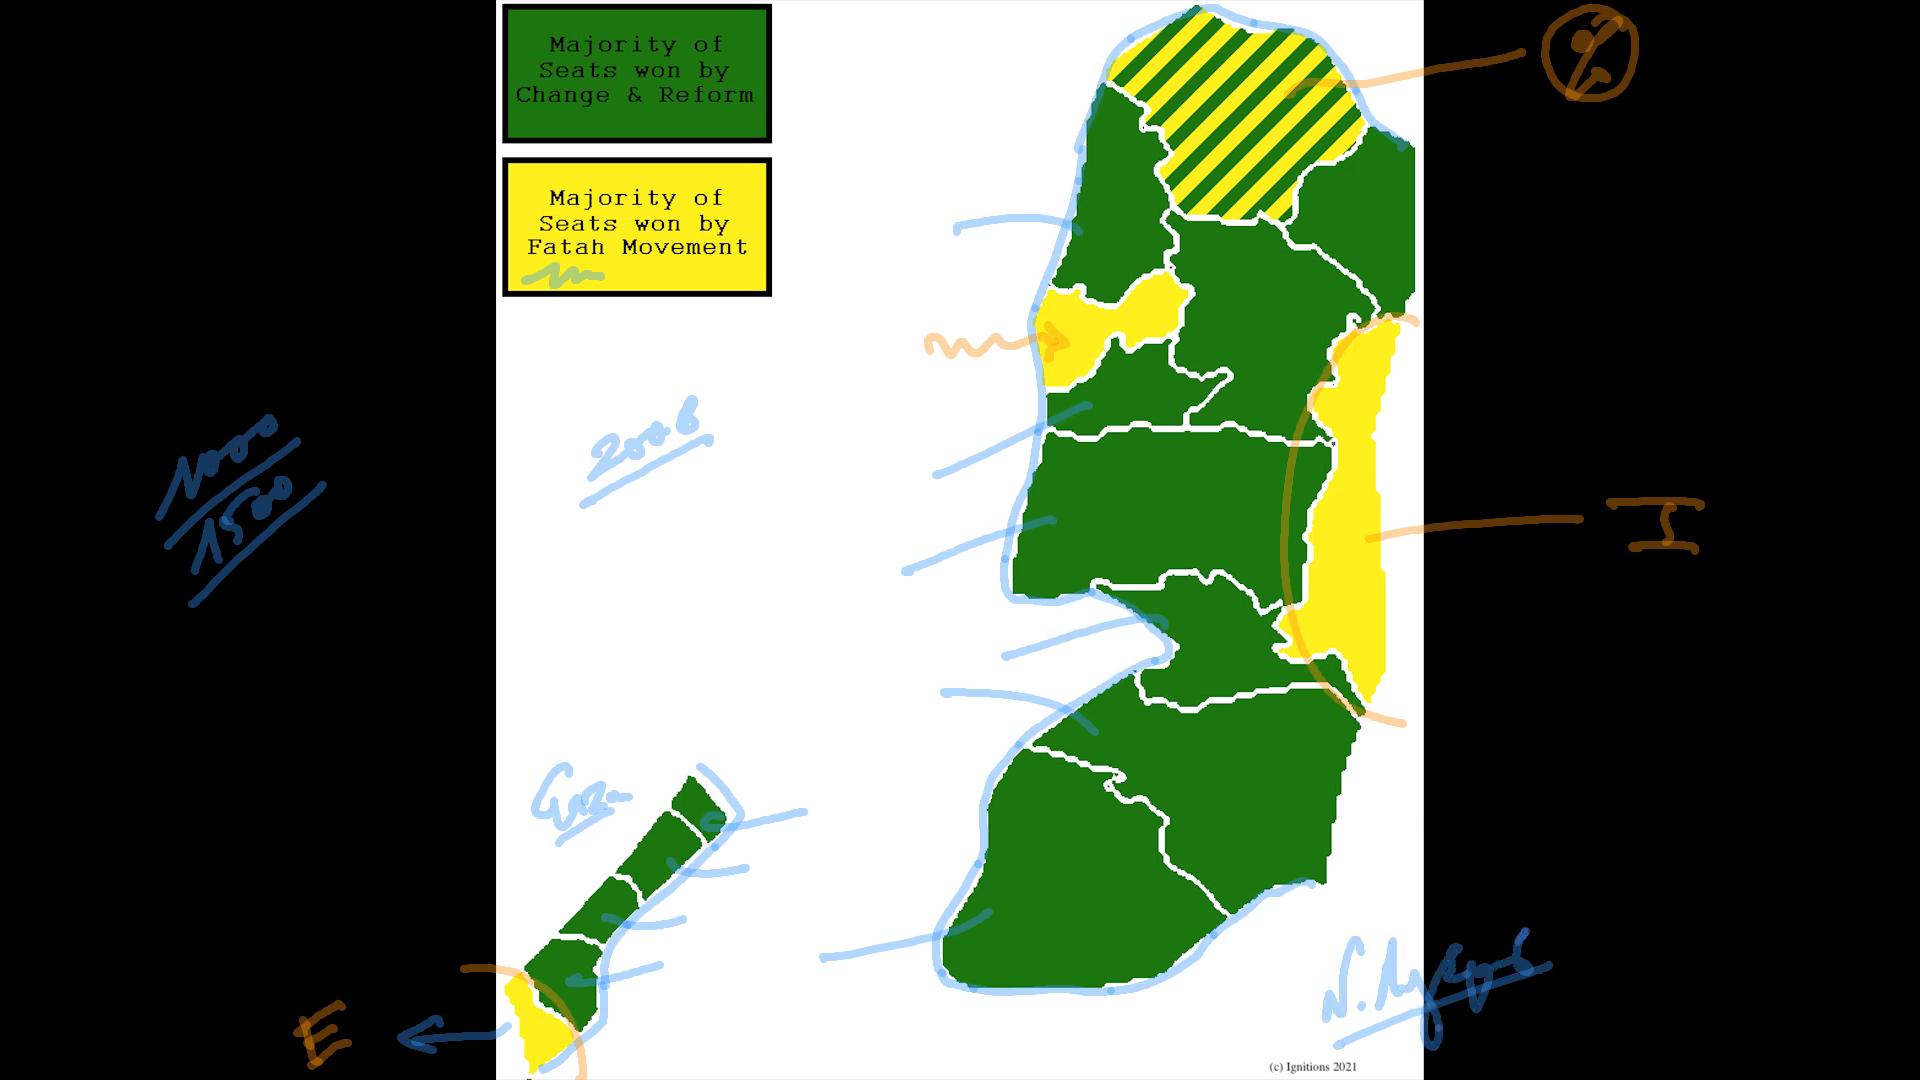 61556 - e-Μάθημα II: Ιστορικό συγκρούσεων στο Ισραήλ. (Dessin)